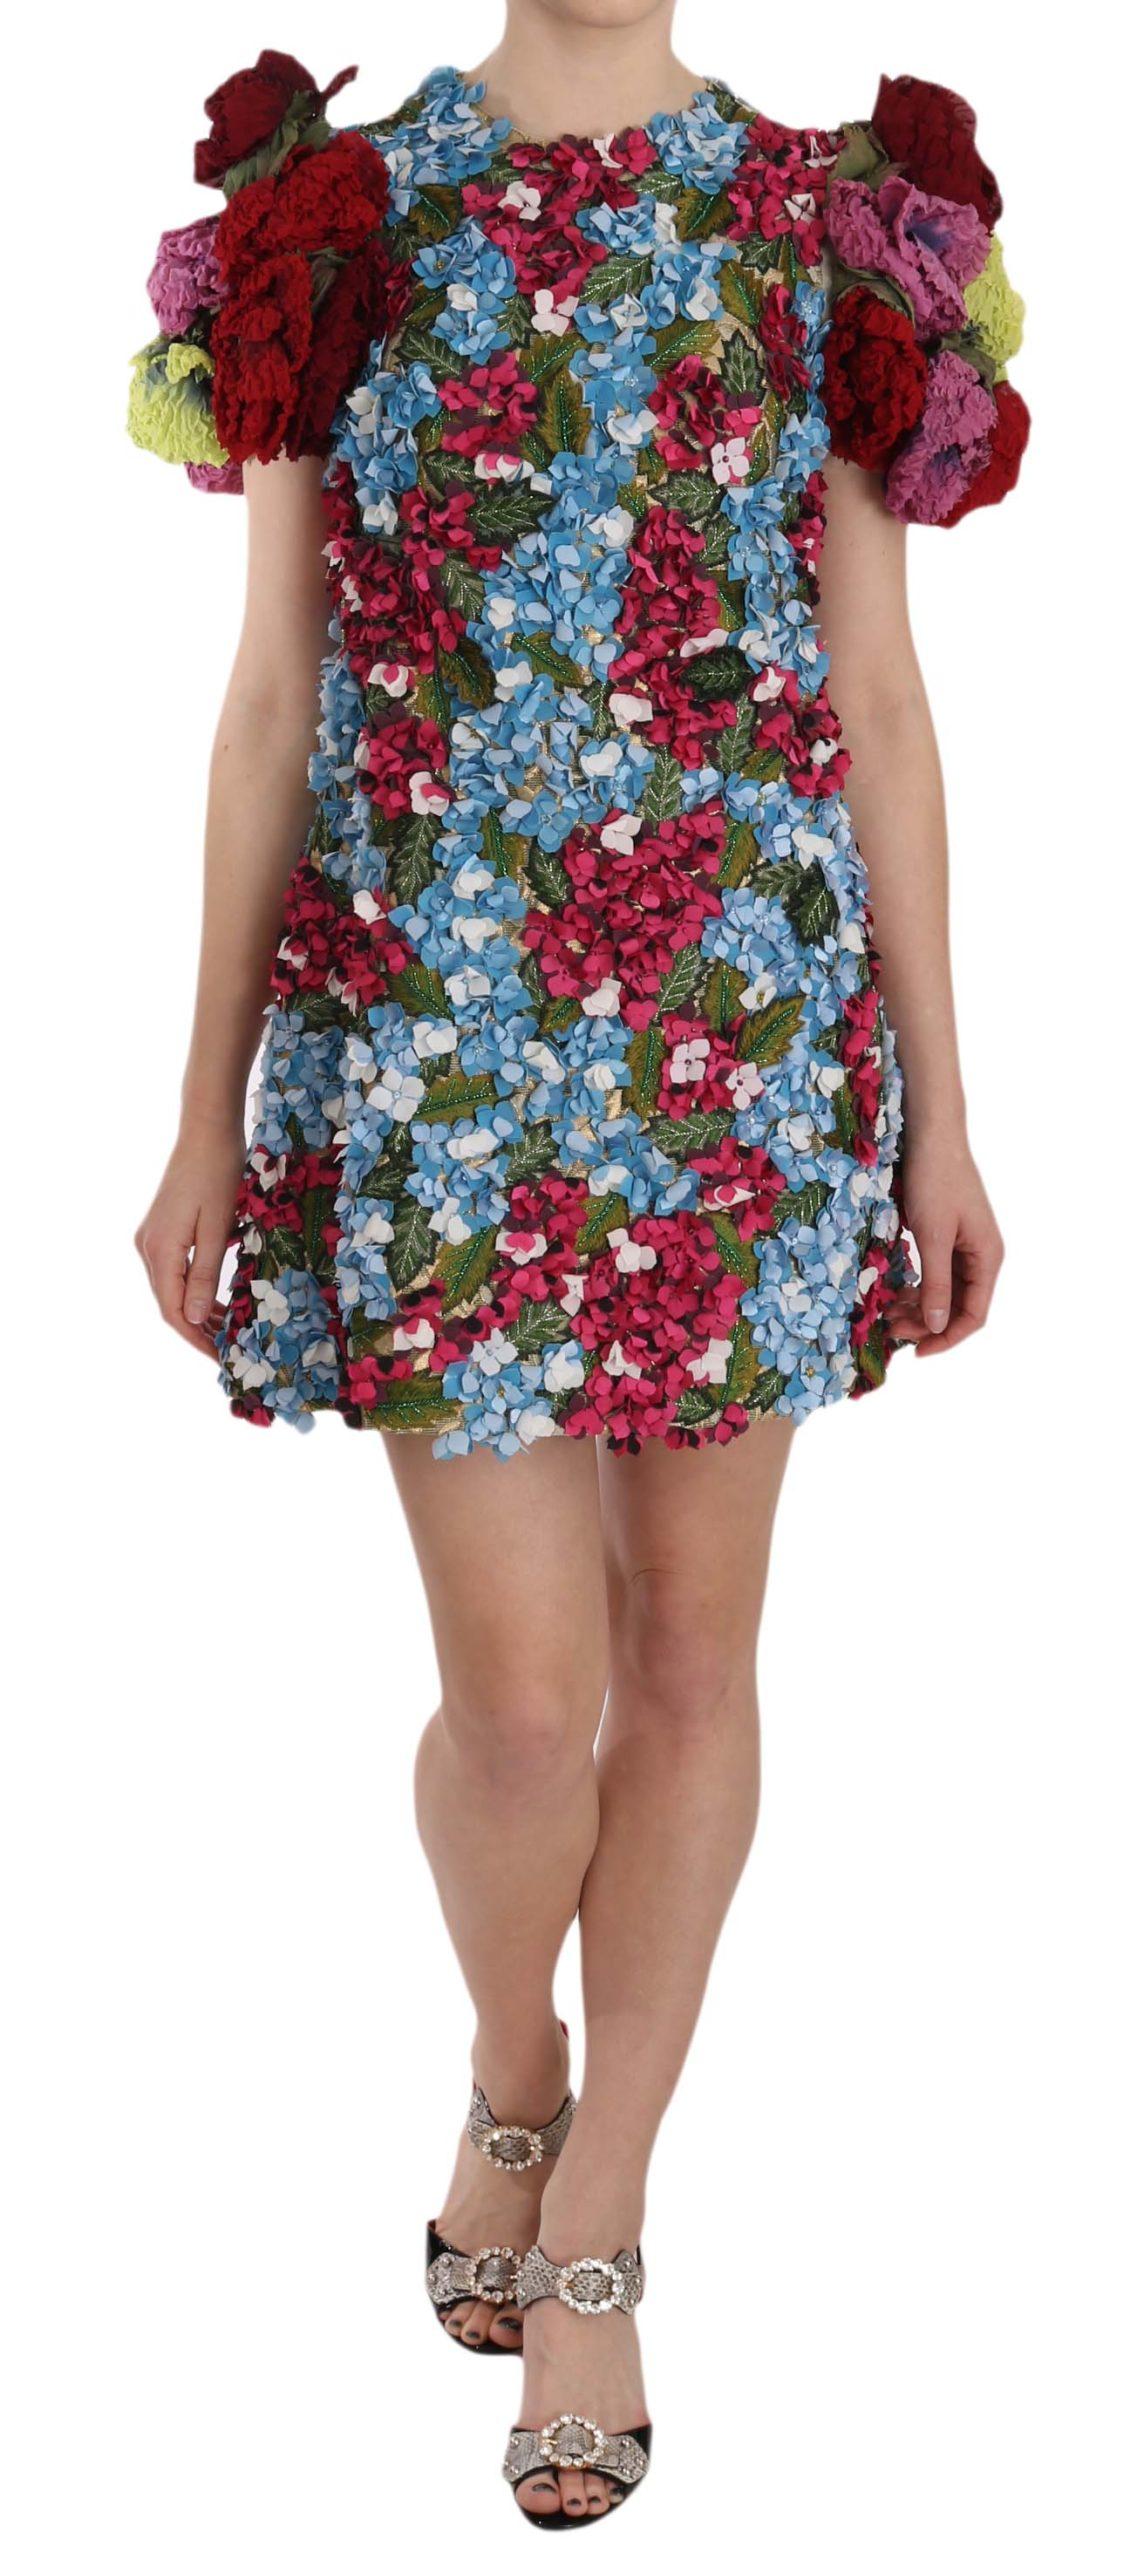 Dolce & Gabbana Women's Floral Button Crystal Mini Dress Multicolor DR1623 - IT38   S